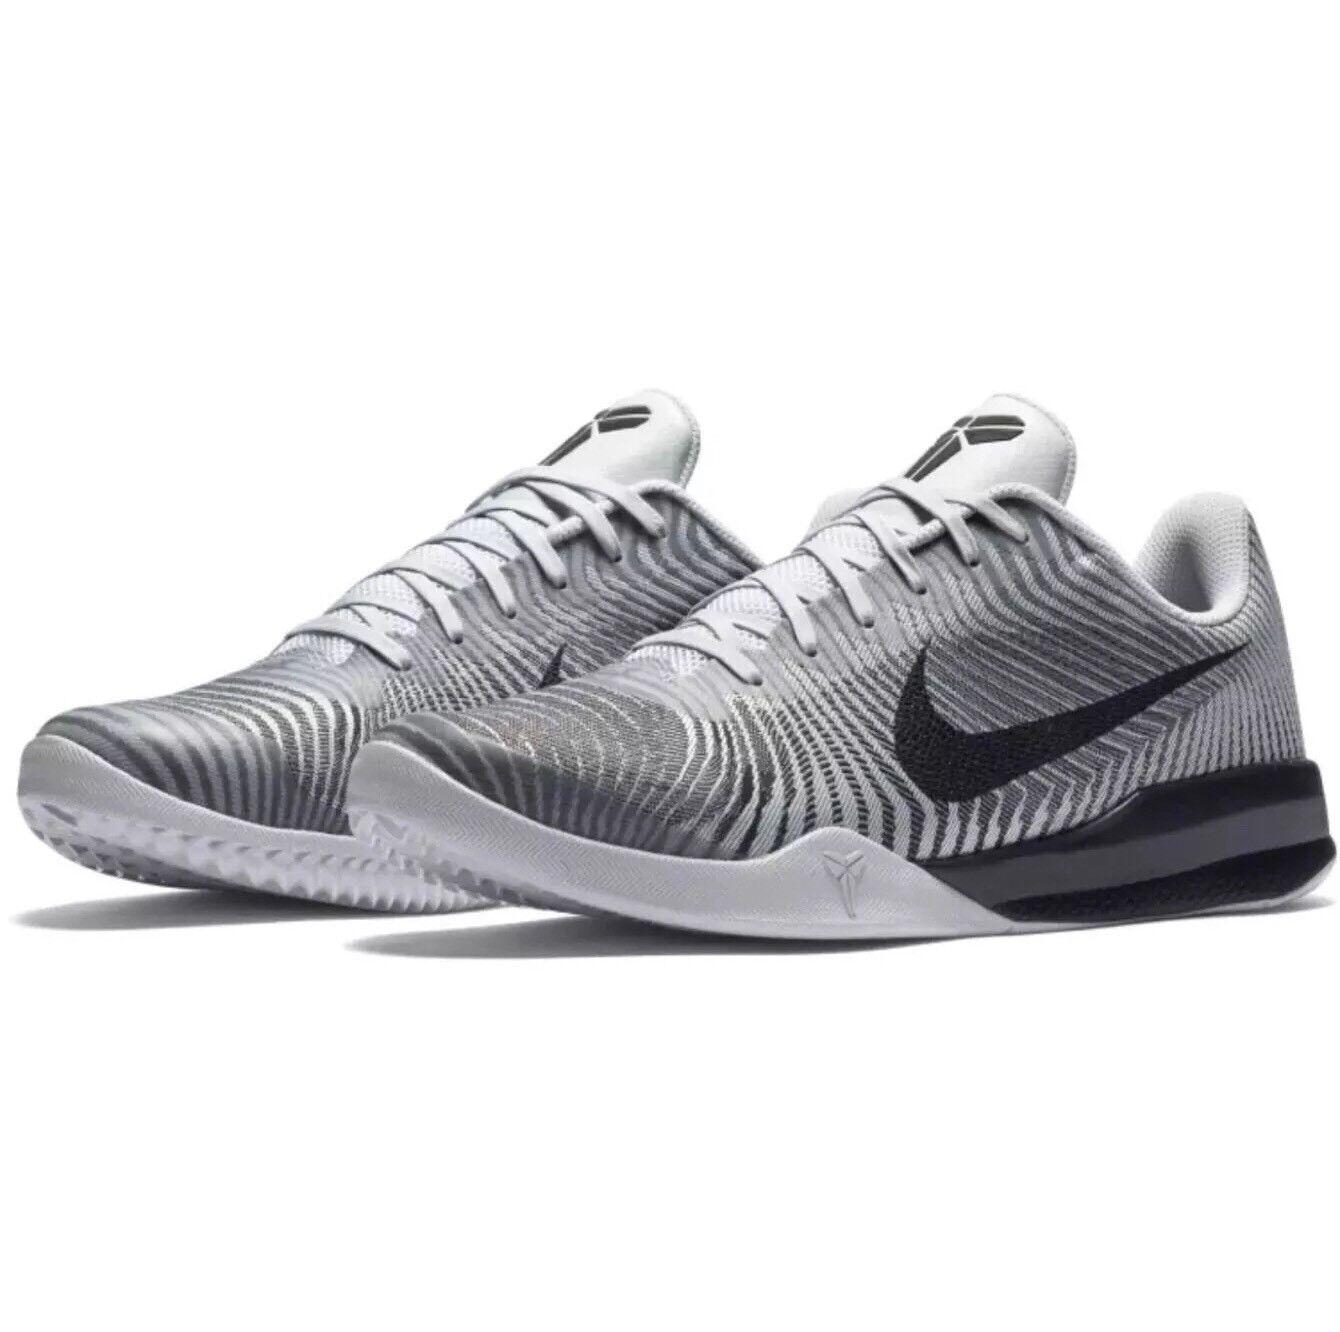 Nike Kobe Mentality II 2 Cool Grey White Black Wolf Silver 818952-100 Mens Sz 14